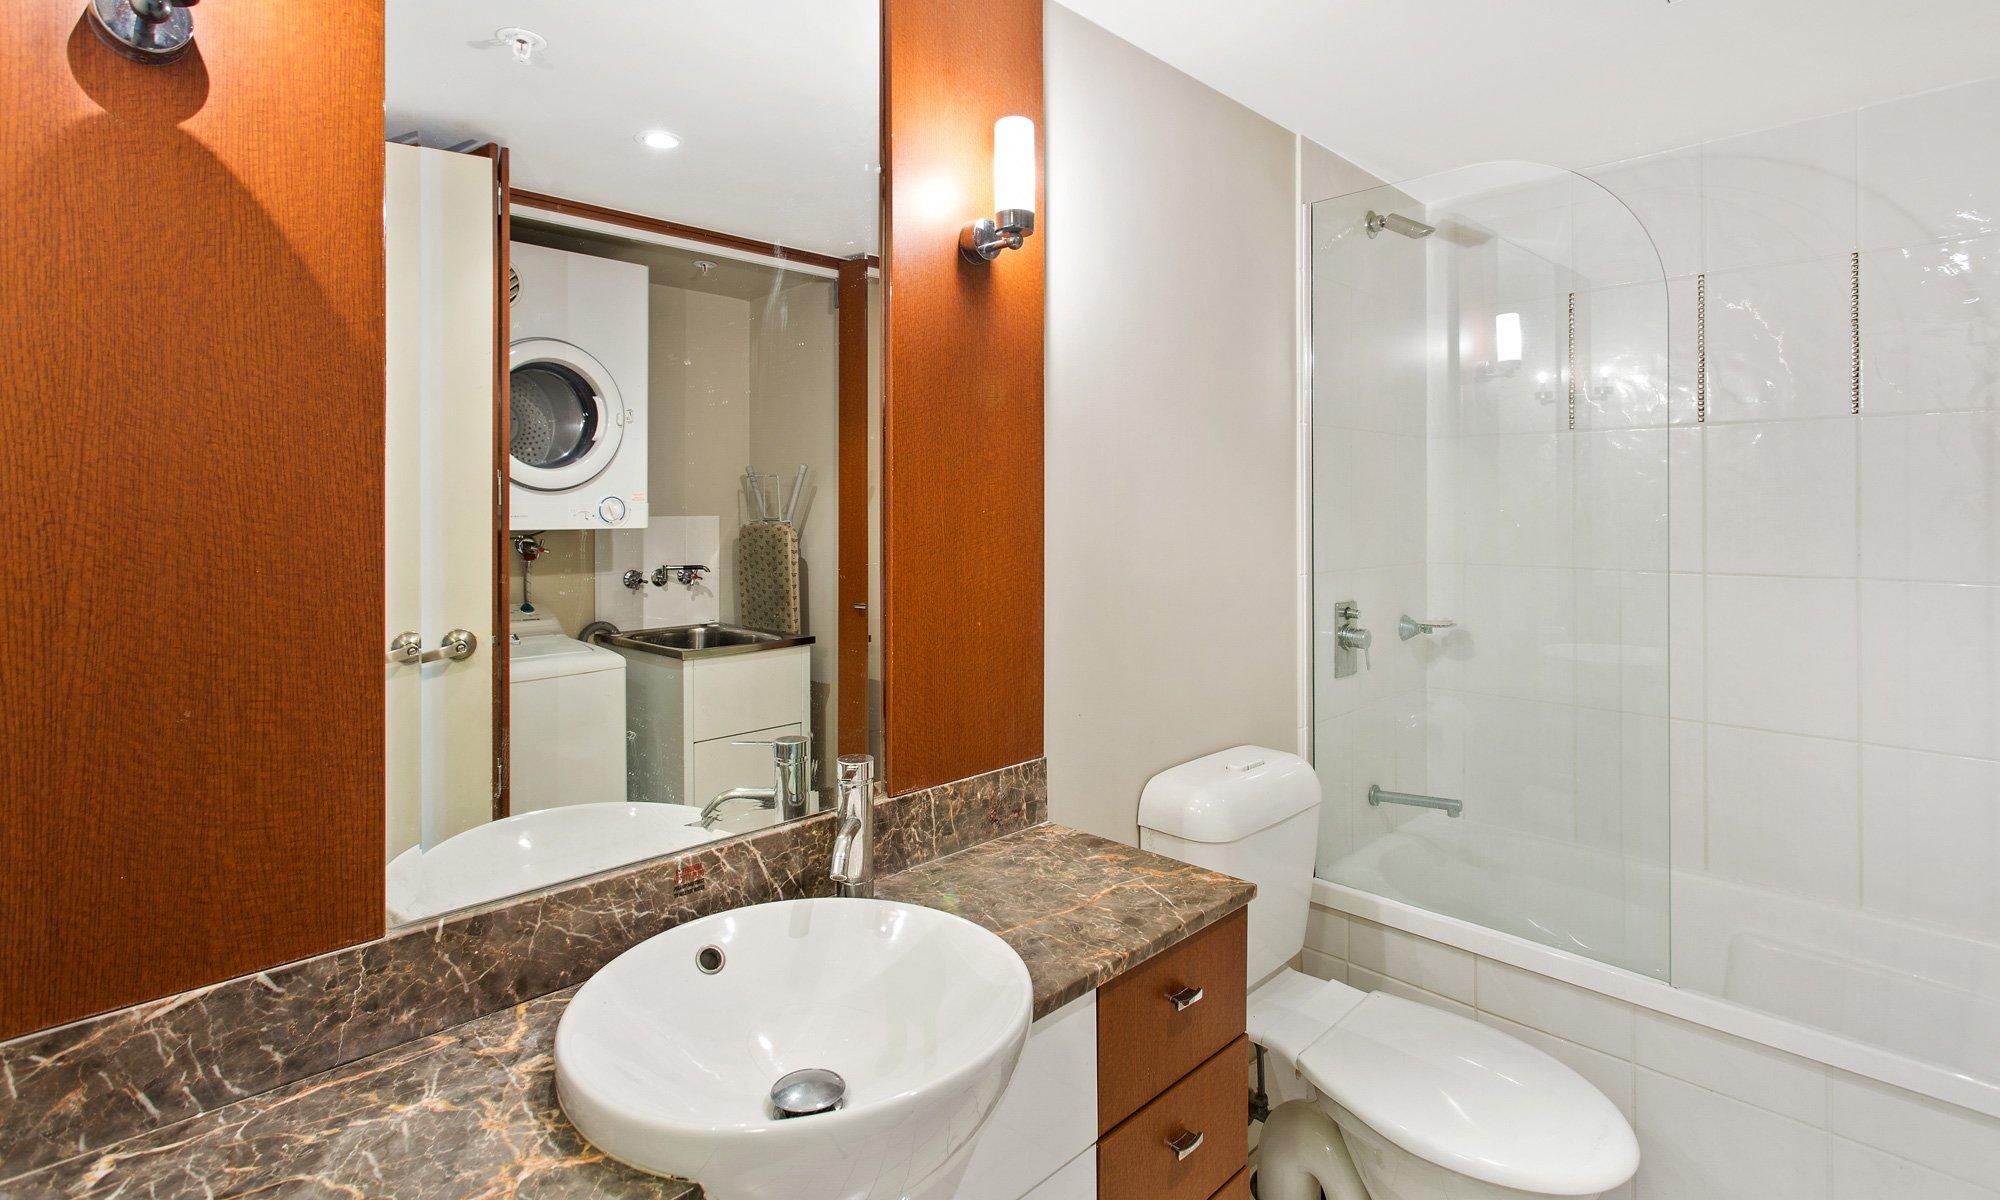 Gold Coast Real Estate for rent Chevron Renaissance 2234 shared bathroom